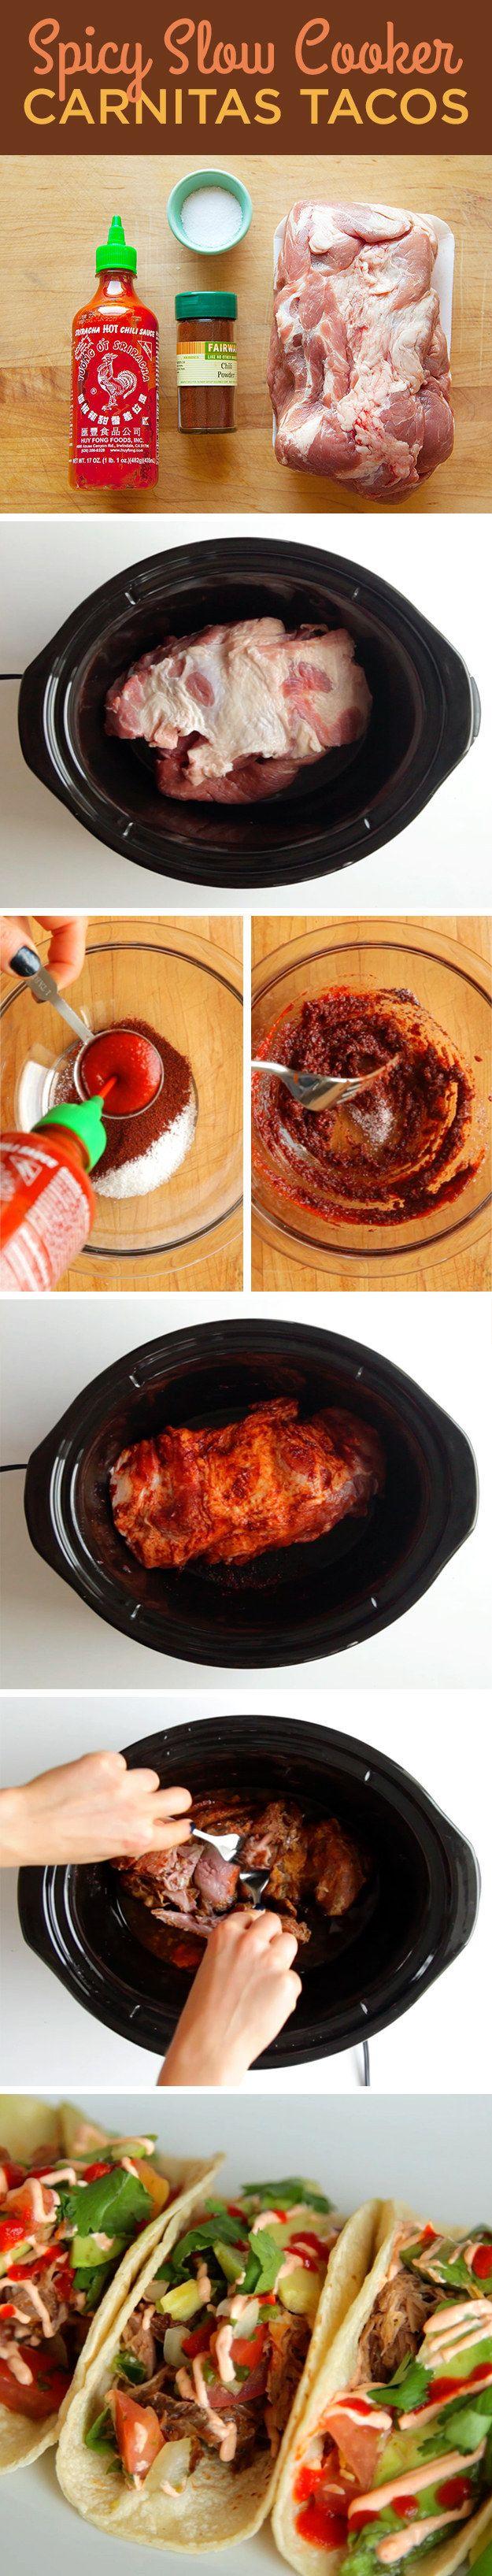 Spicy Slow Cooker Carnitas Tacos